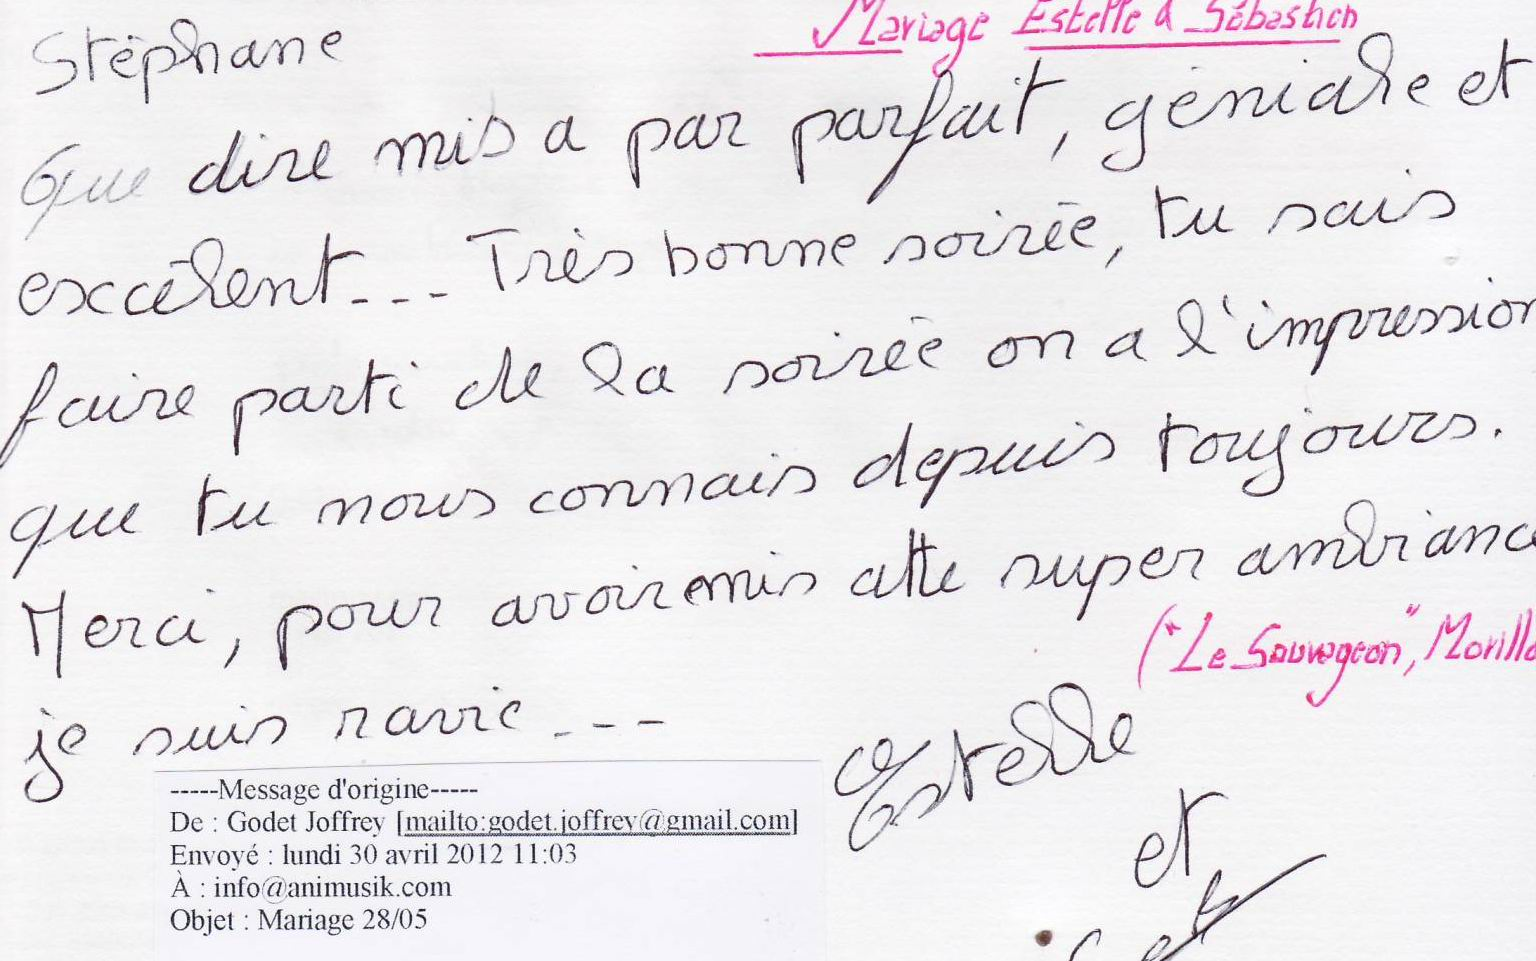 Mariage_DAUBIAS_Sébastien_&_Estelle_(Le_Sauvageon_Morillon)_(28-04-2012)